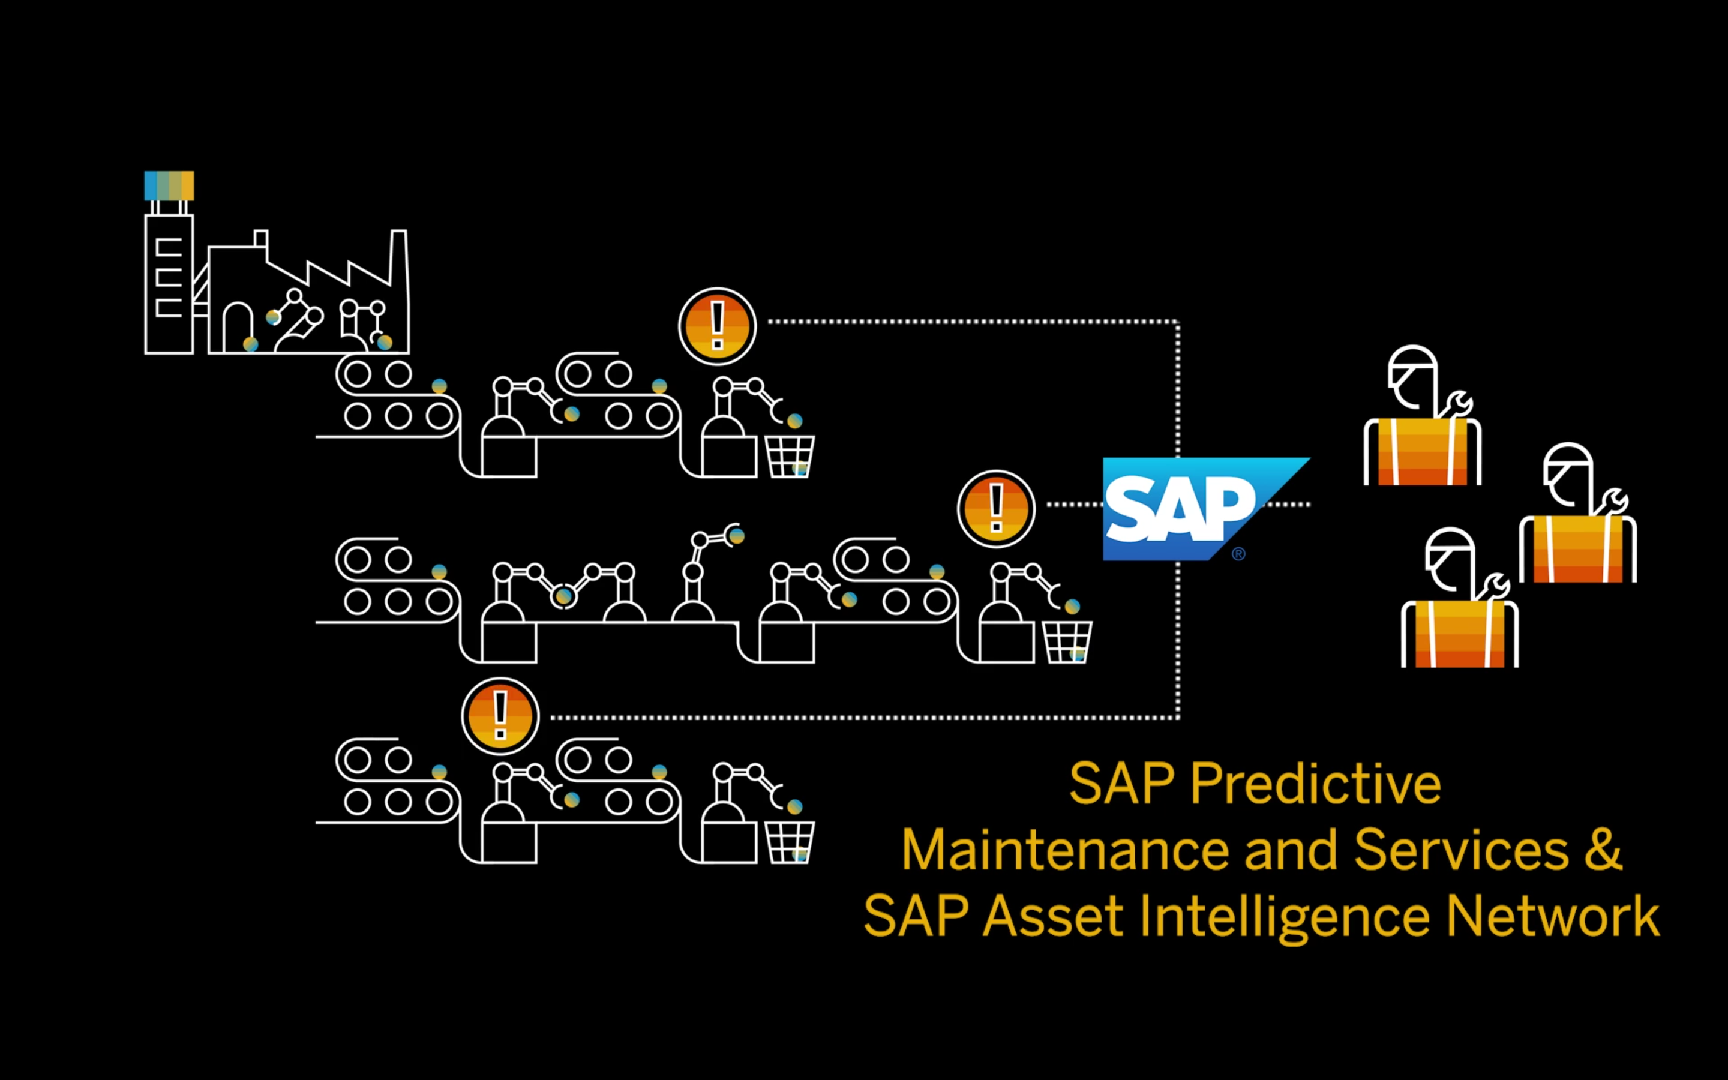 SAP Predictive Maintenance Network